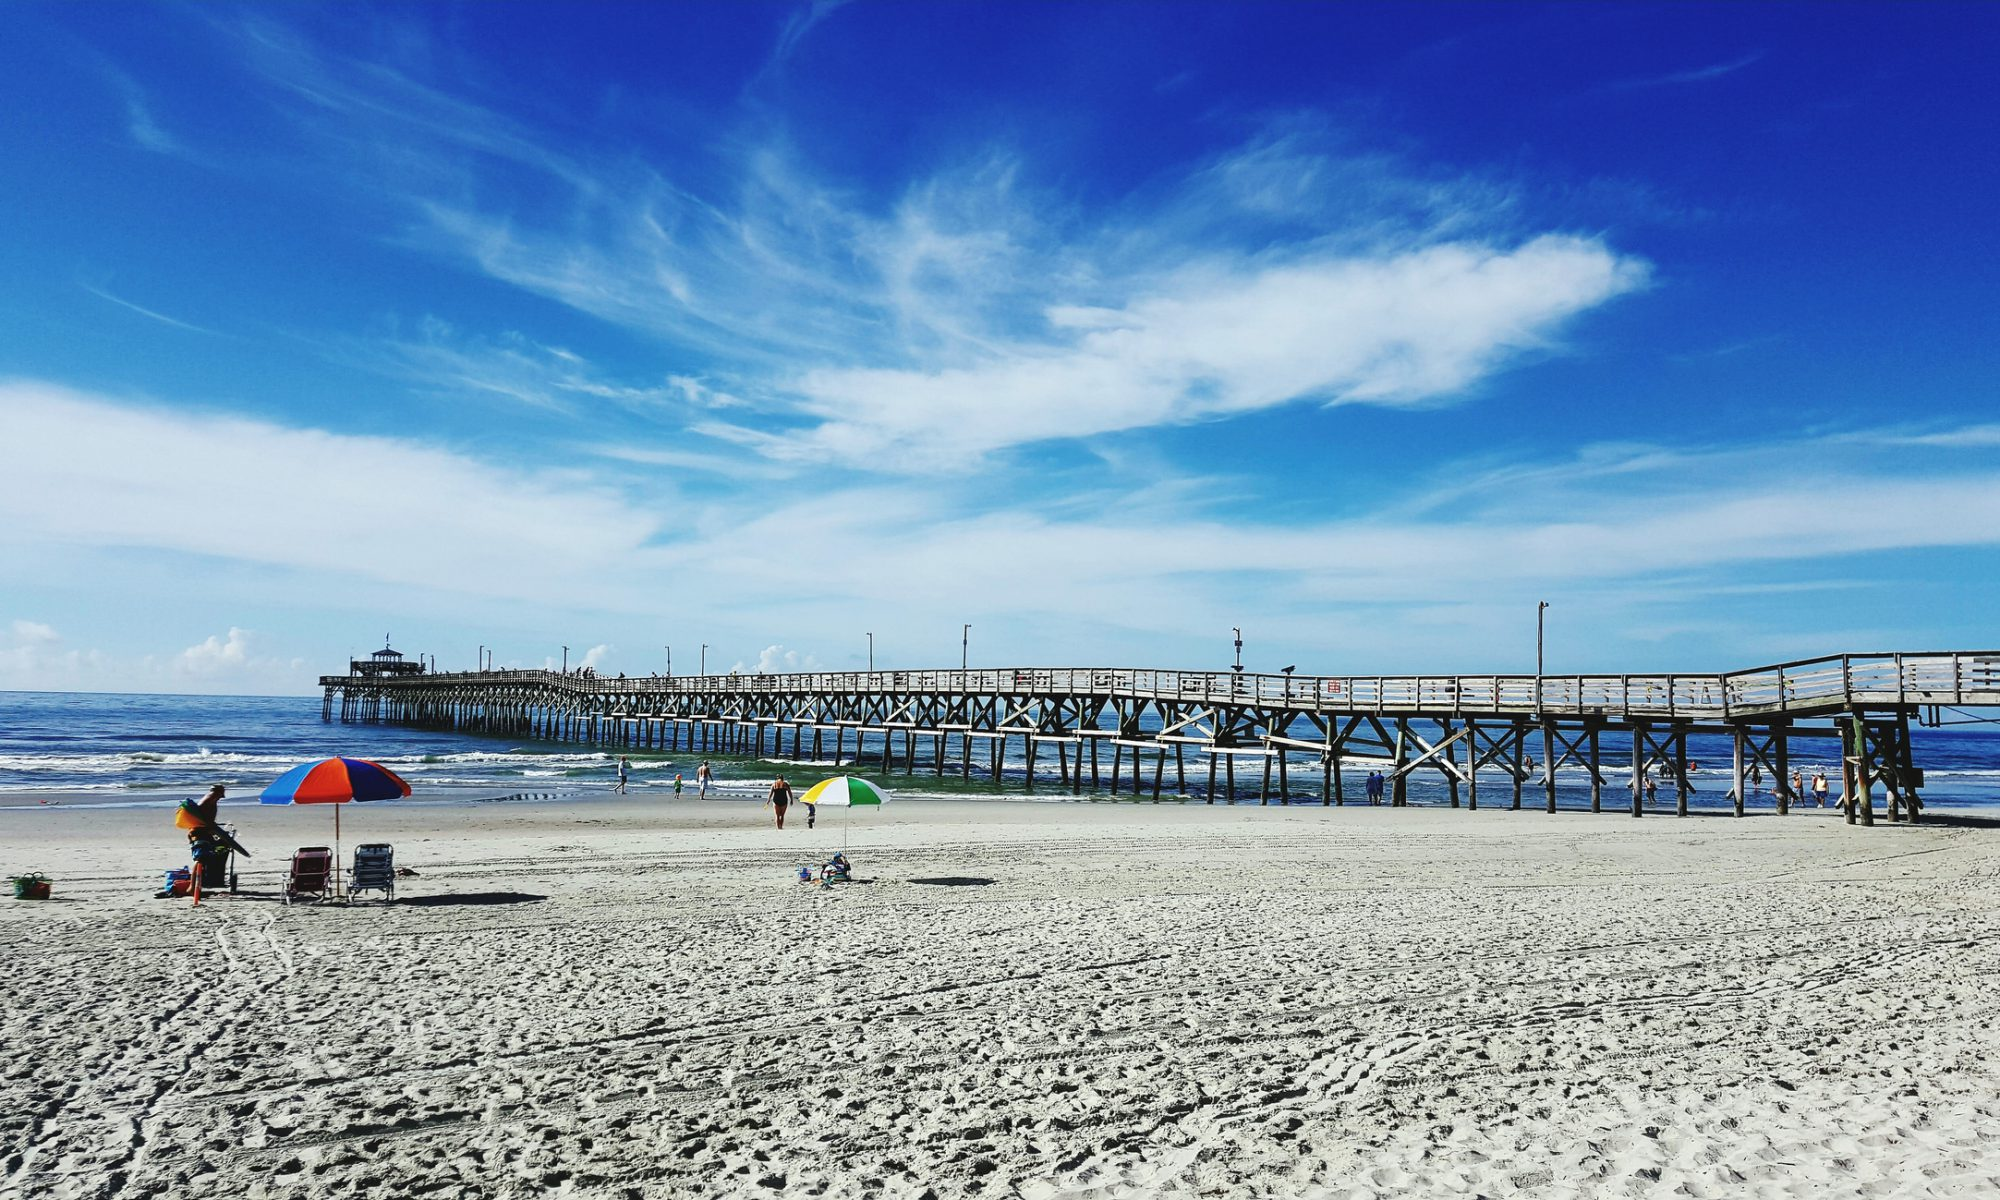 beach, pier, people on beach with umbrella